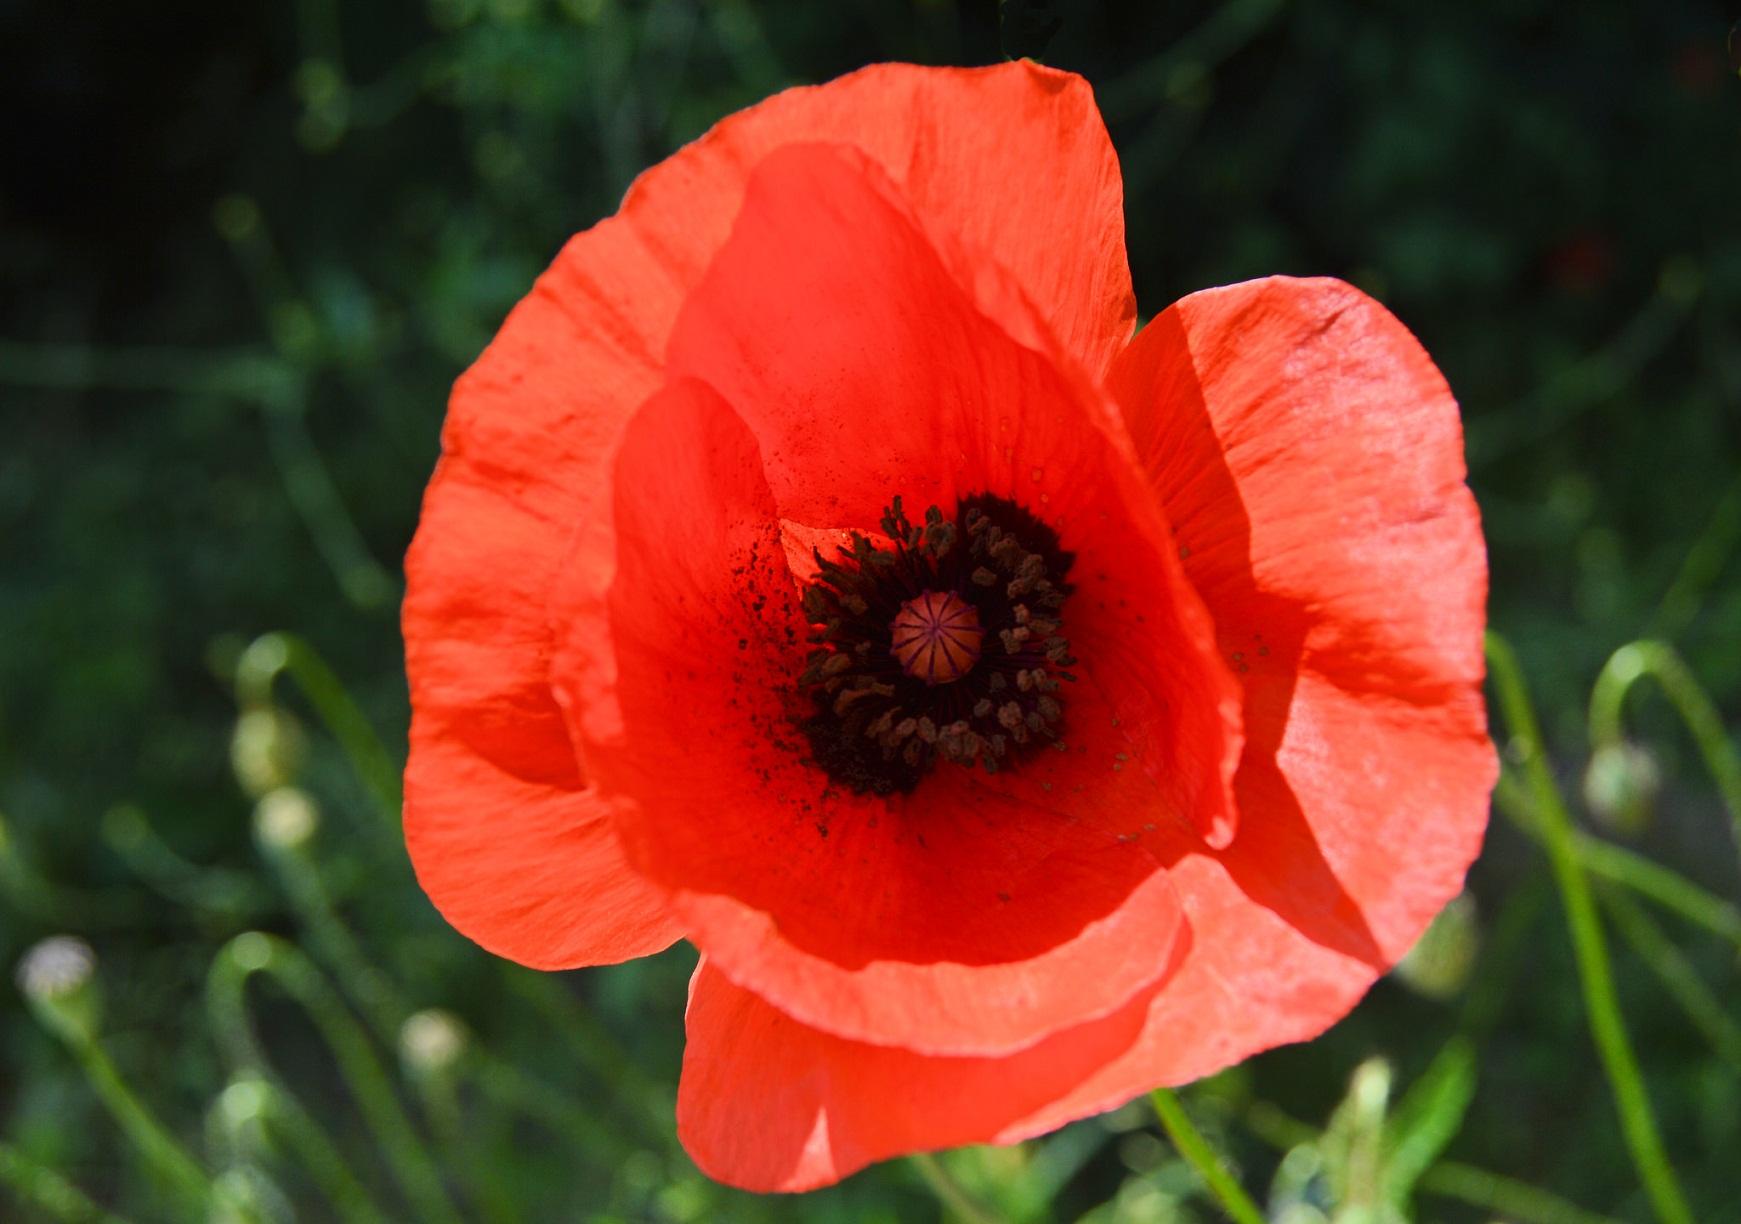 Flower names in hindi and english list of flowers poppy khasakhas afeem papaver somniferum mightylinksfo